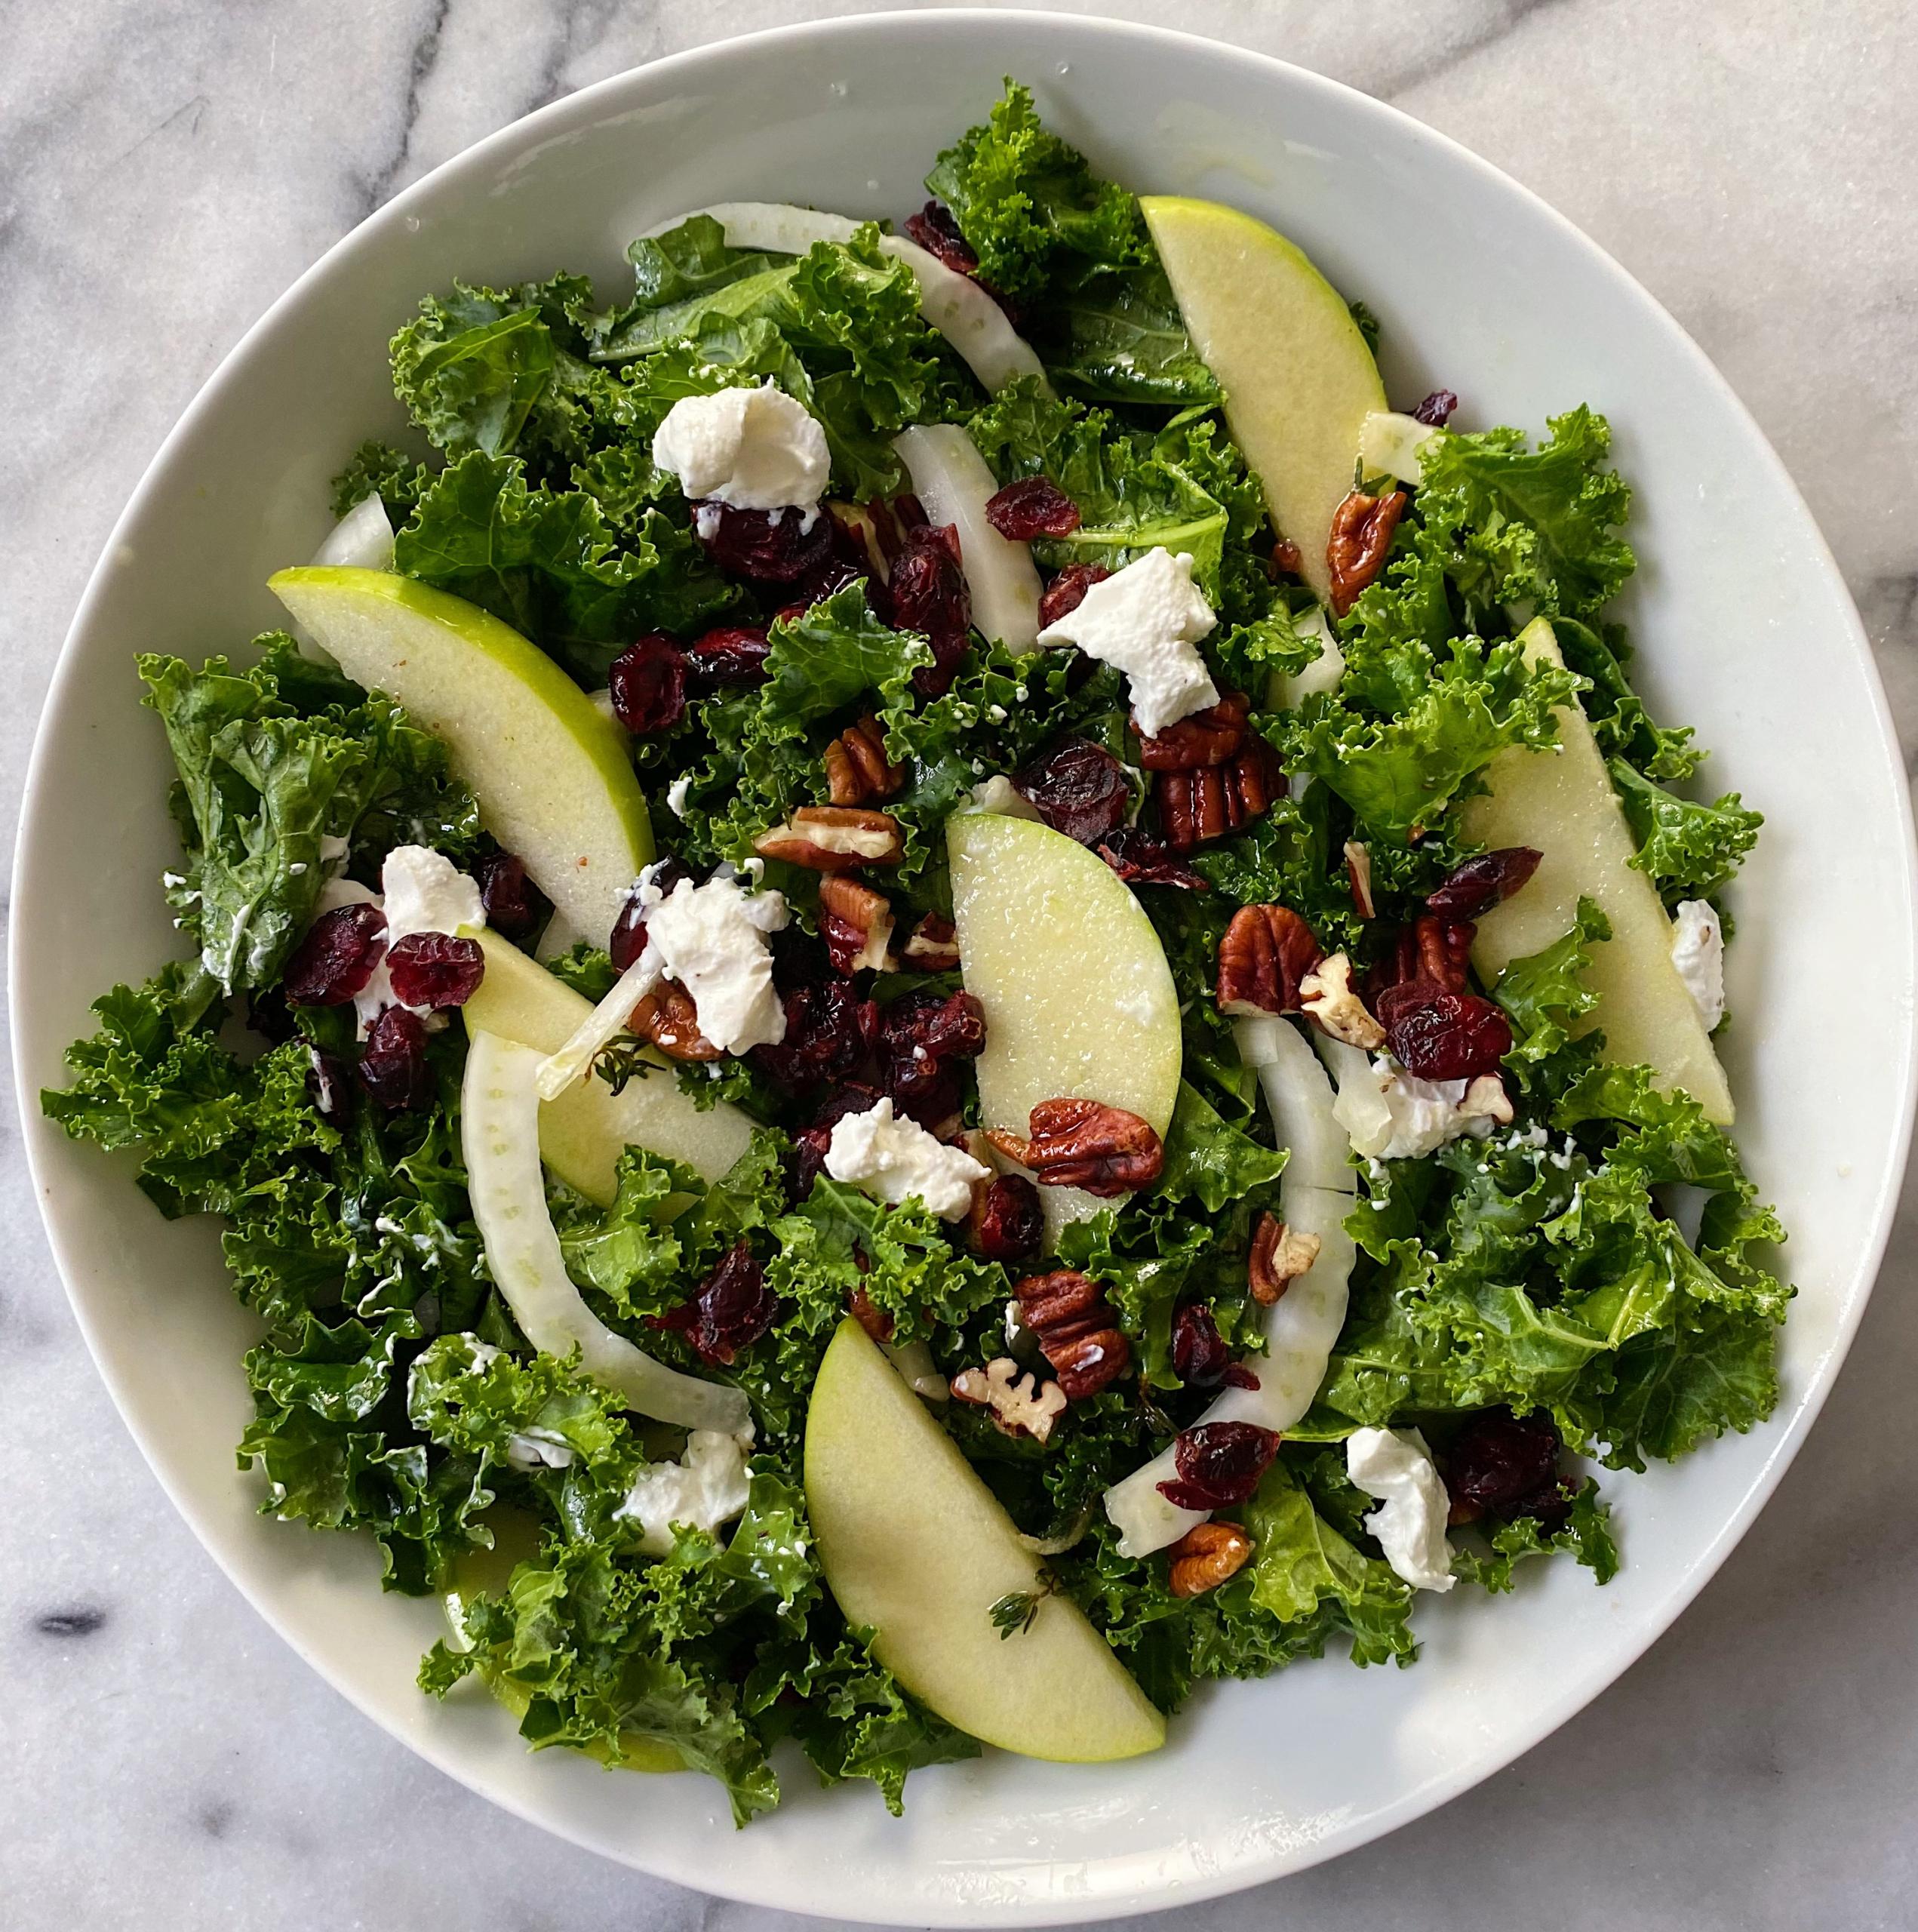 Kale Salad cranberries pecans goat cheese gluten free #glutenfreerecipes www.healthygffamily.com